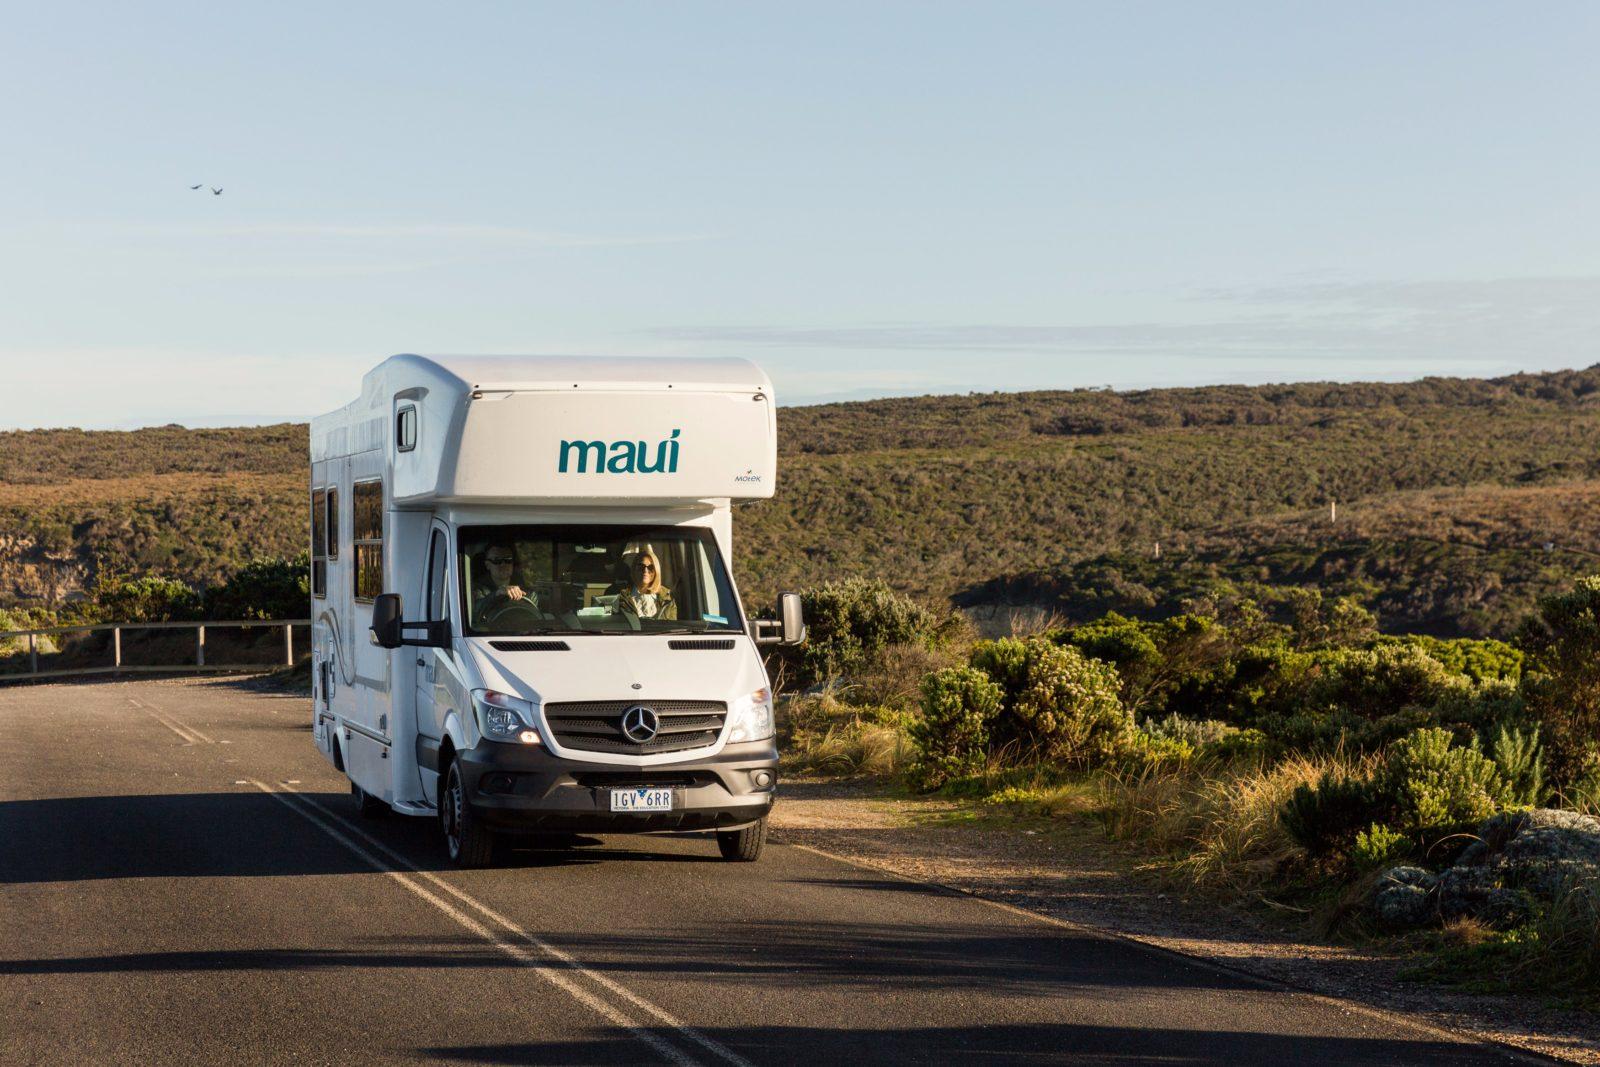 Maui Motorhomes, Redcliffe, Western Australia